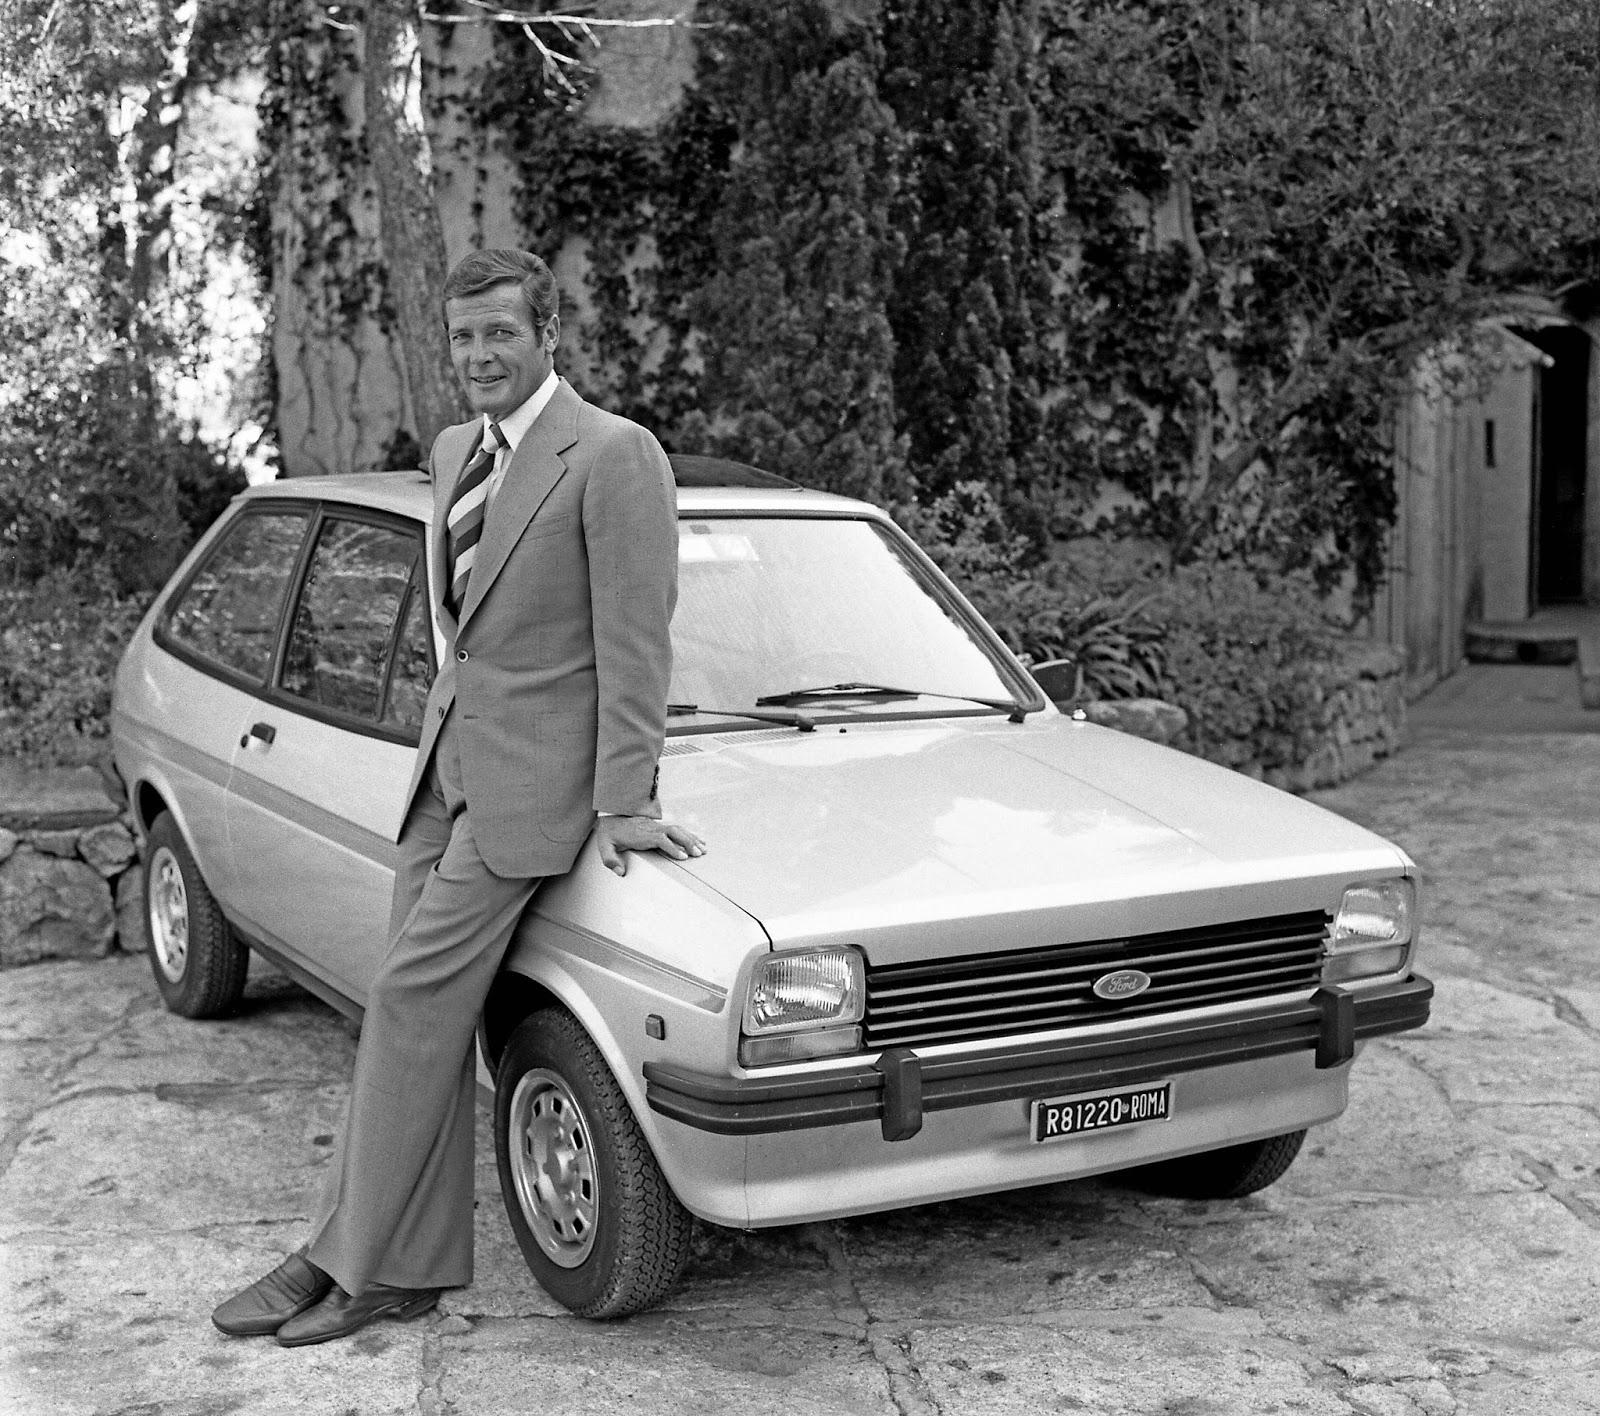 FordFiesta 1976 1983 007RogerMoore 1976 01 2 Έκανες Πολύ Δρόμο Μωρό μου! - Το Ford Fiesta Γίνεται 40 Ετών Ford, Ford Fiesta, Fun, videos, zblog